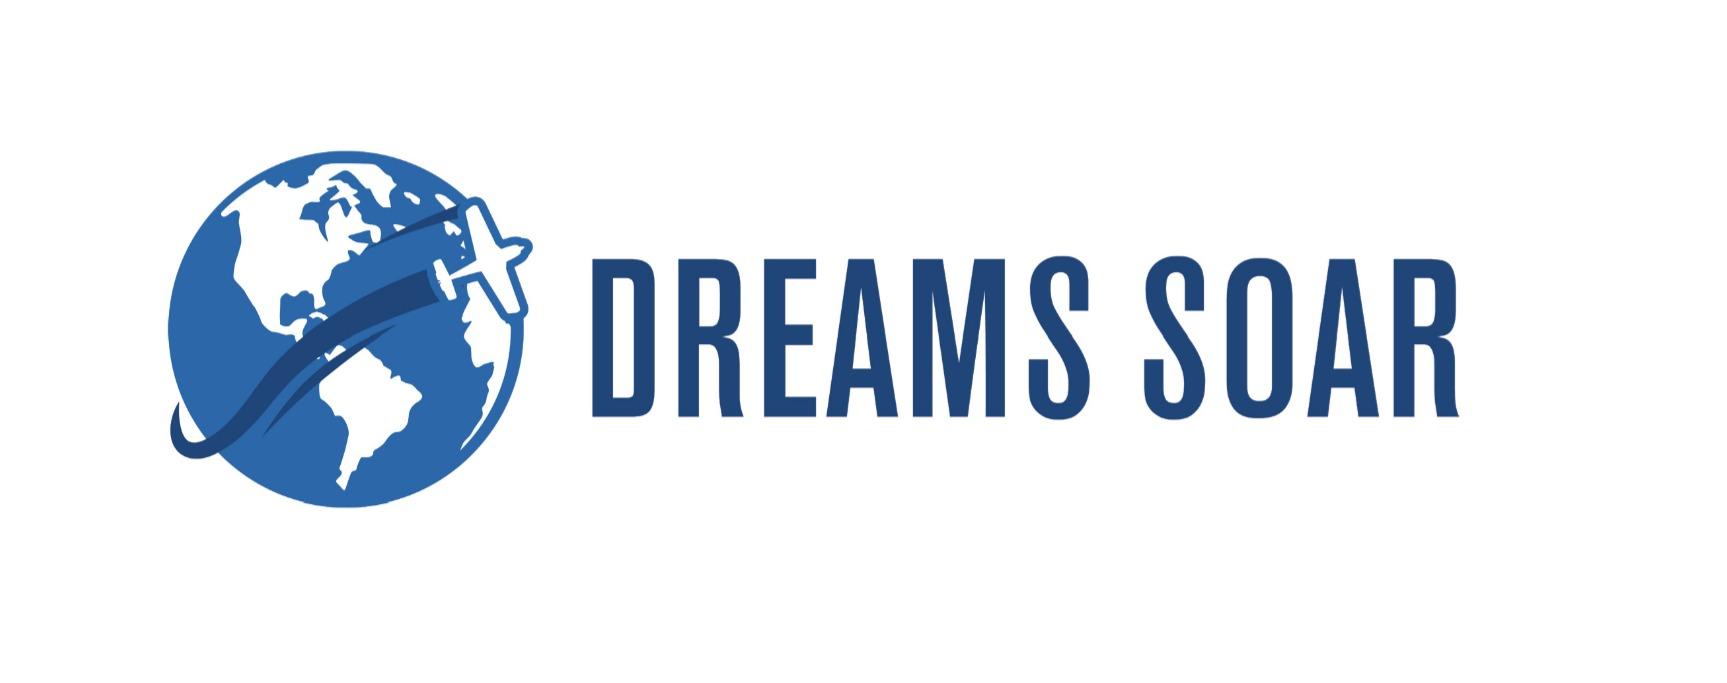 Dreams Soar, Inc.